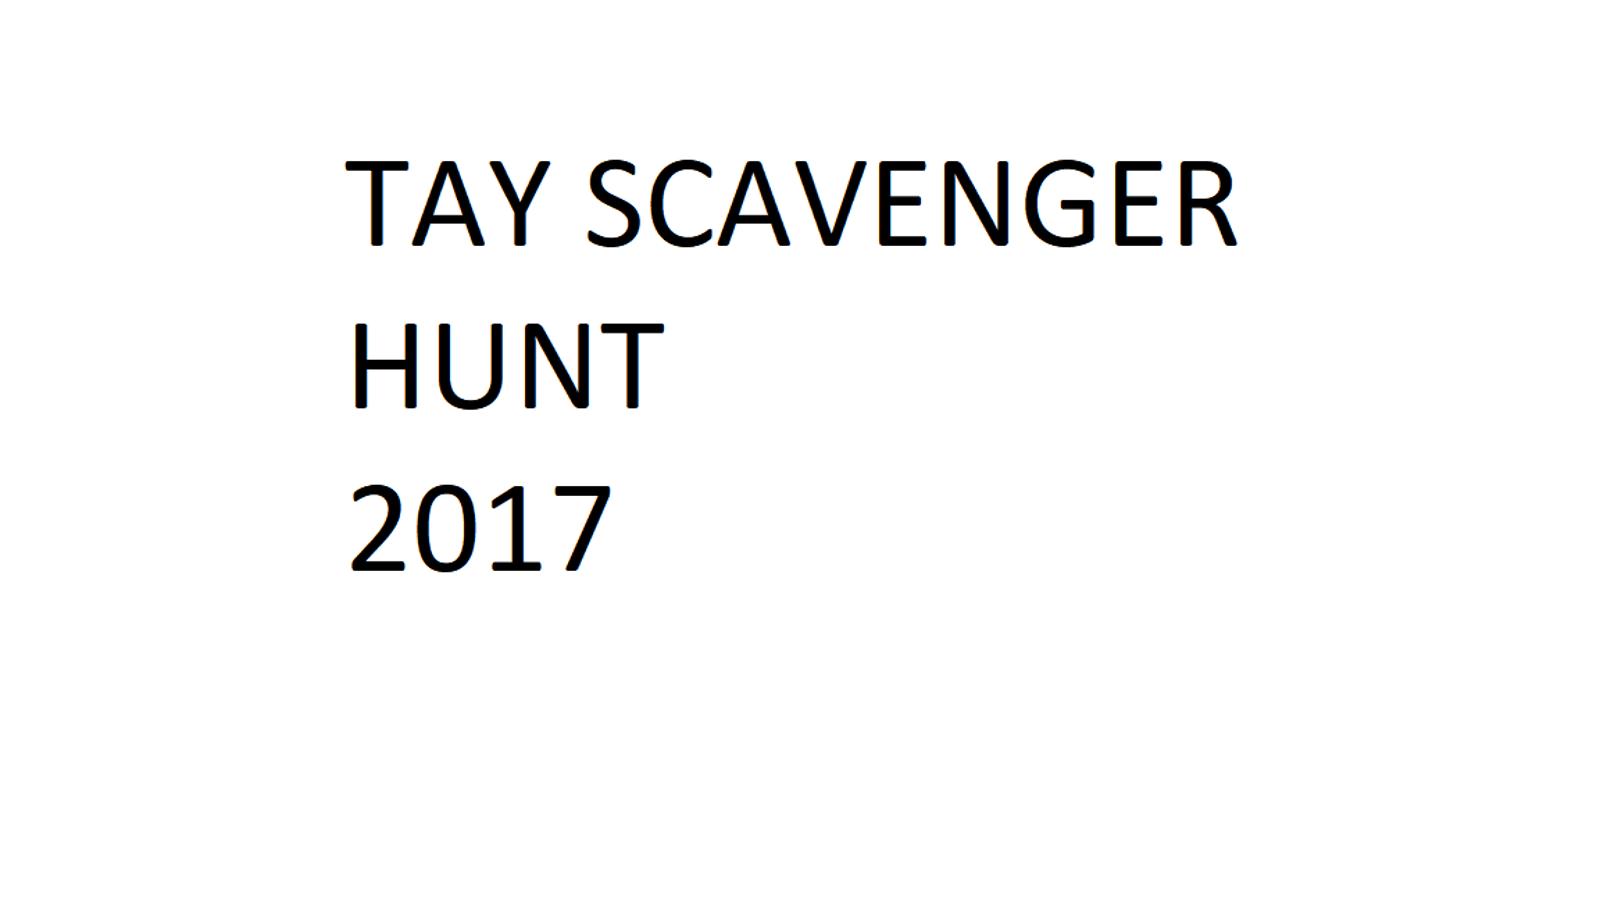 TAY Scavenger Hunt: The Wild Hunt